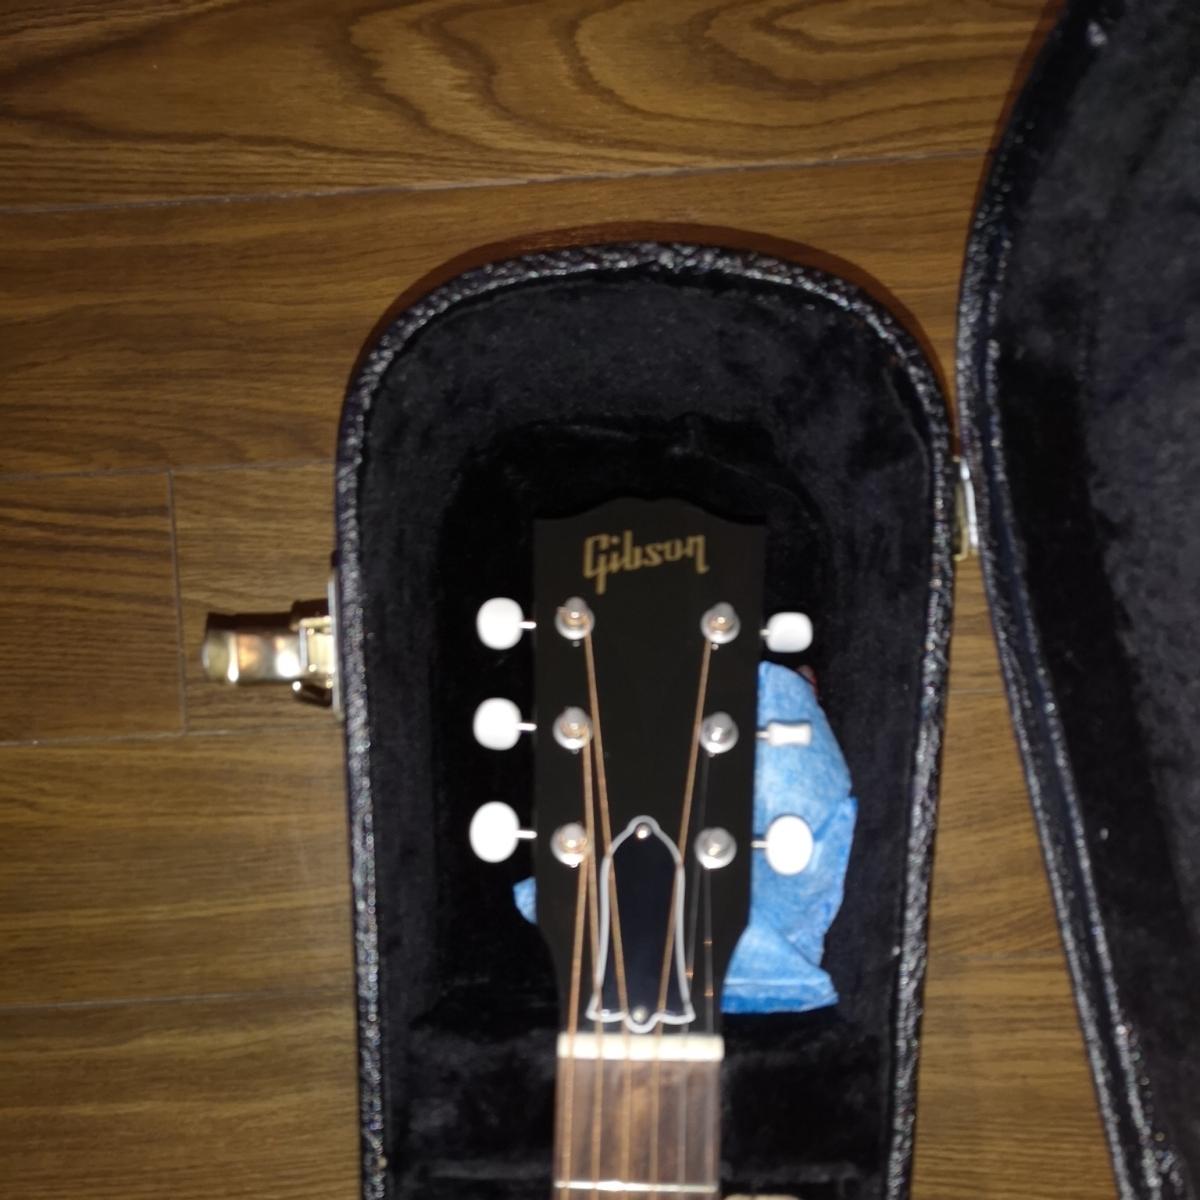 Gibson LG-2 American Eagle _画像3